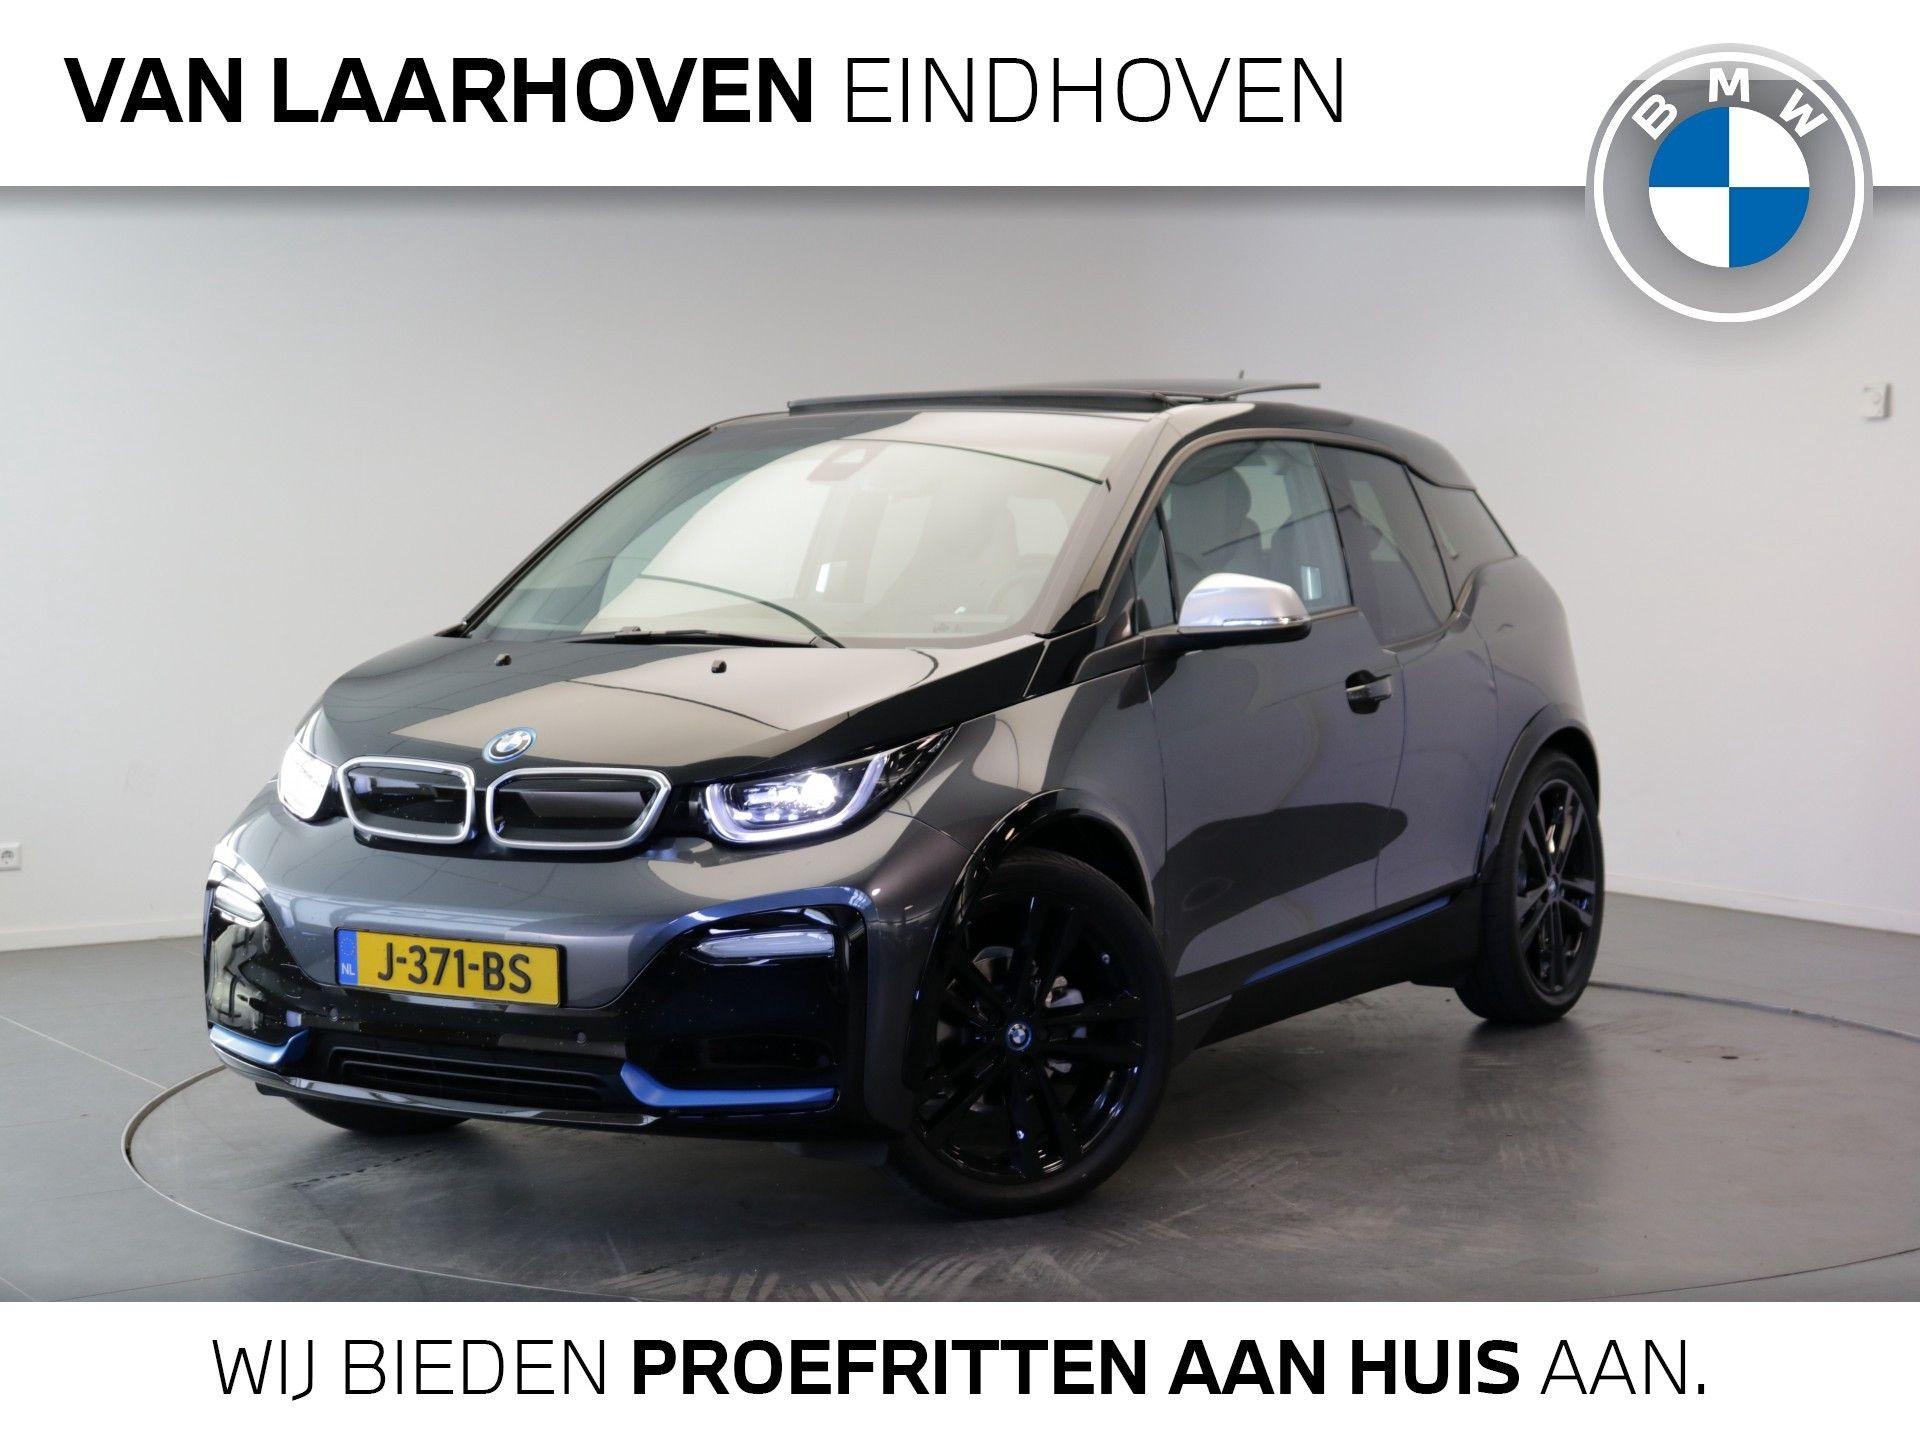 BMW i3 S Executive Edition 120Ah 42 kWh Comfort pack advanced / Connectivity Pack / Elektrisch verwarmde voorstoelen / Warmte pomp / BMW i Interieurdesign Suite / Elektrisch glazen schuif-/kanteldak